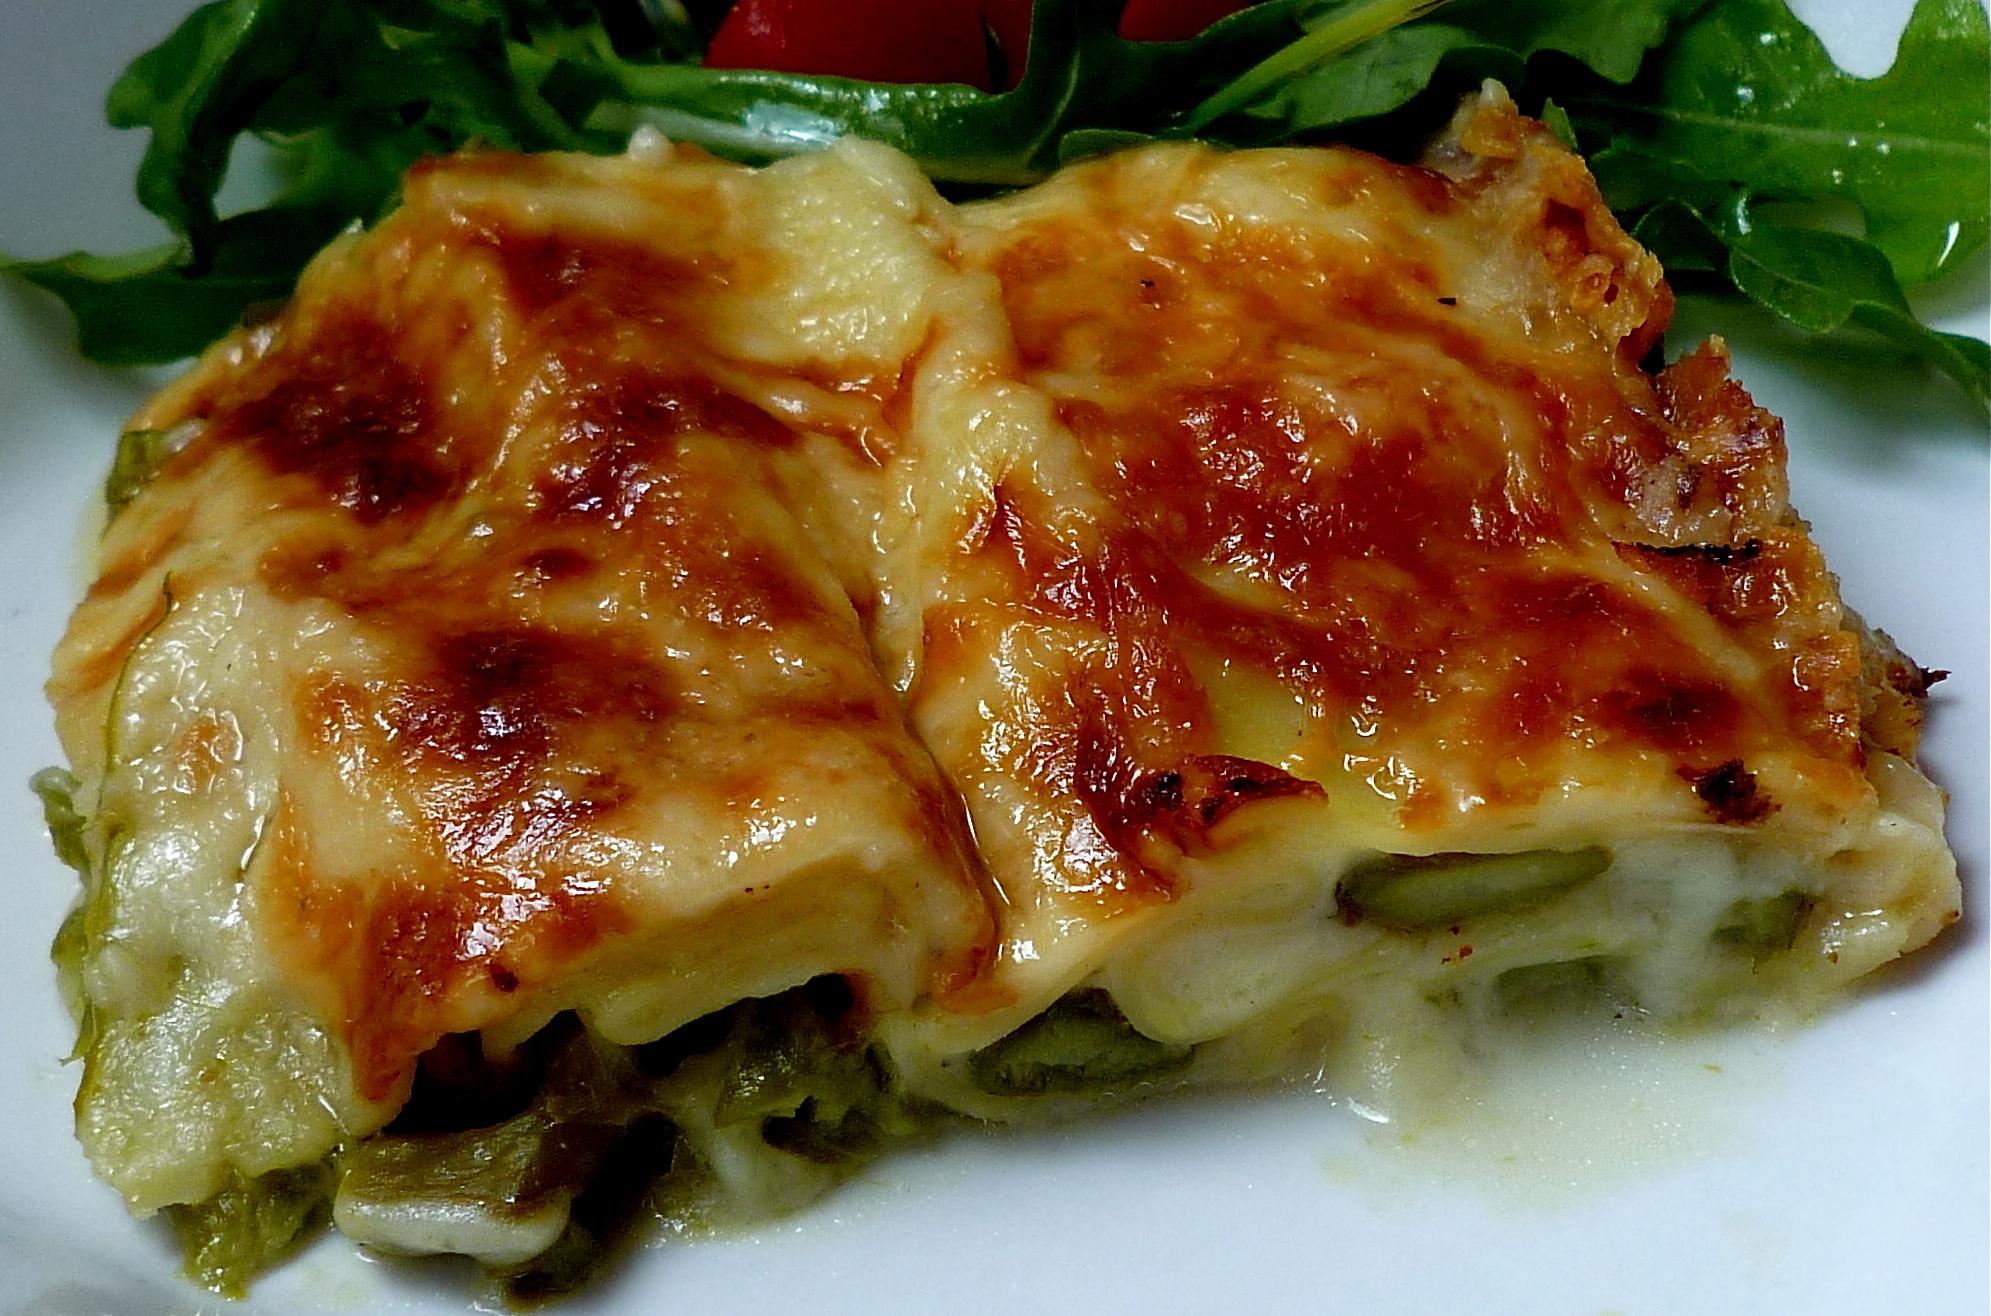 Roasted Asparagus Lasagna with Salad